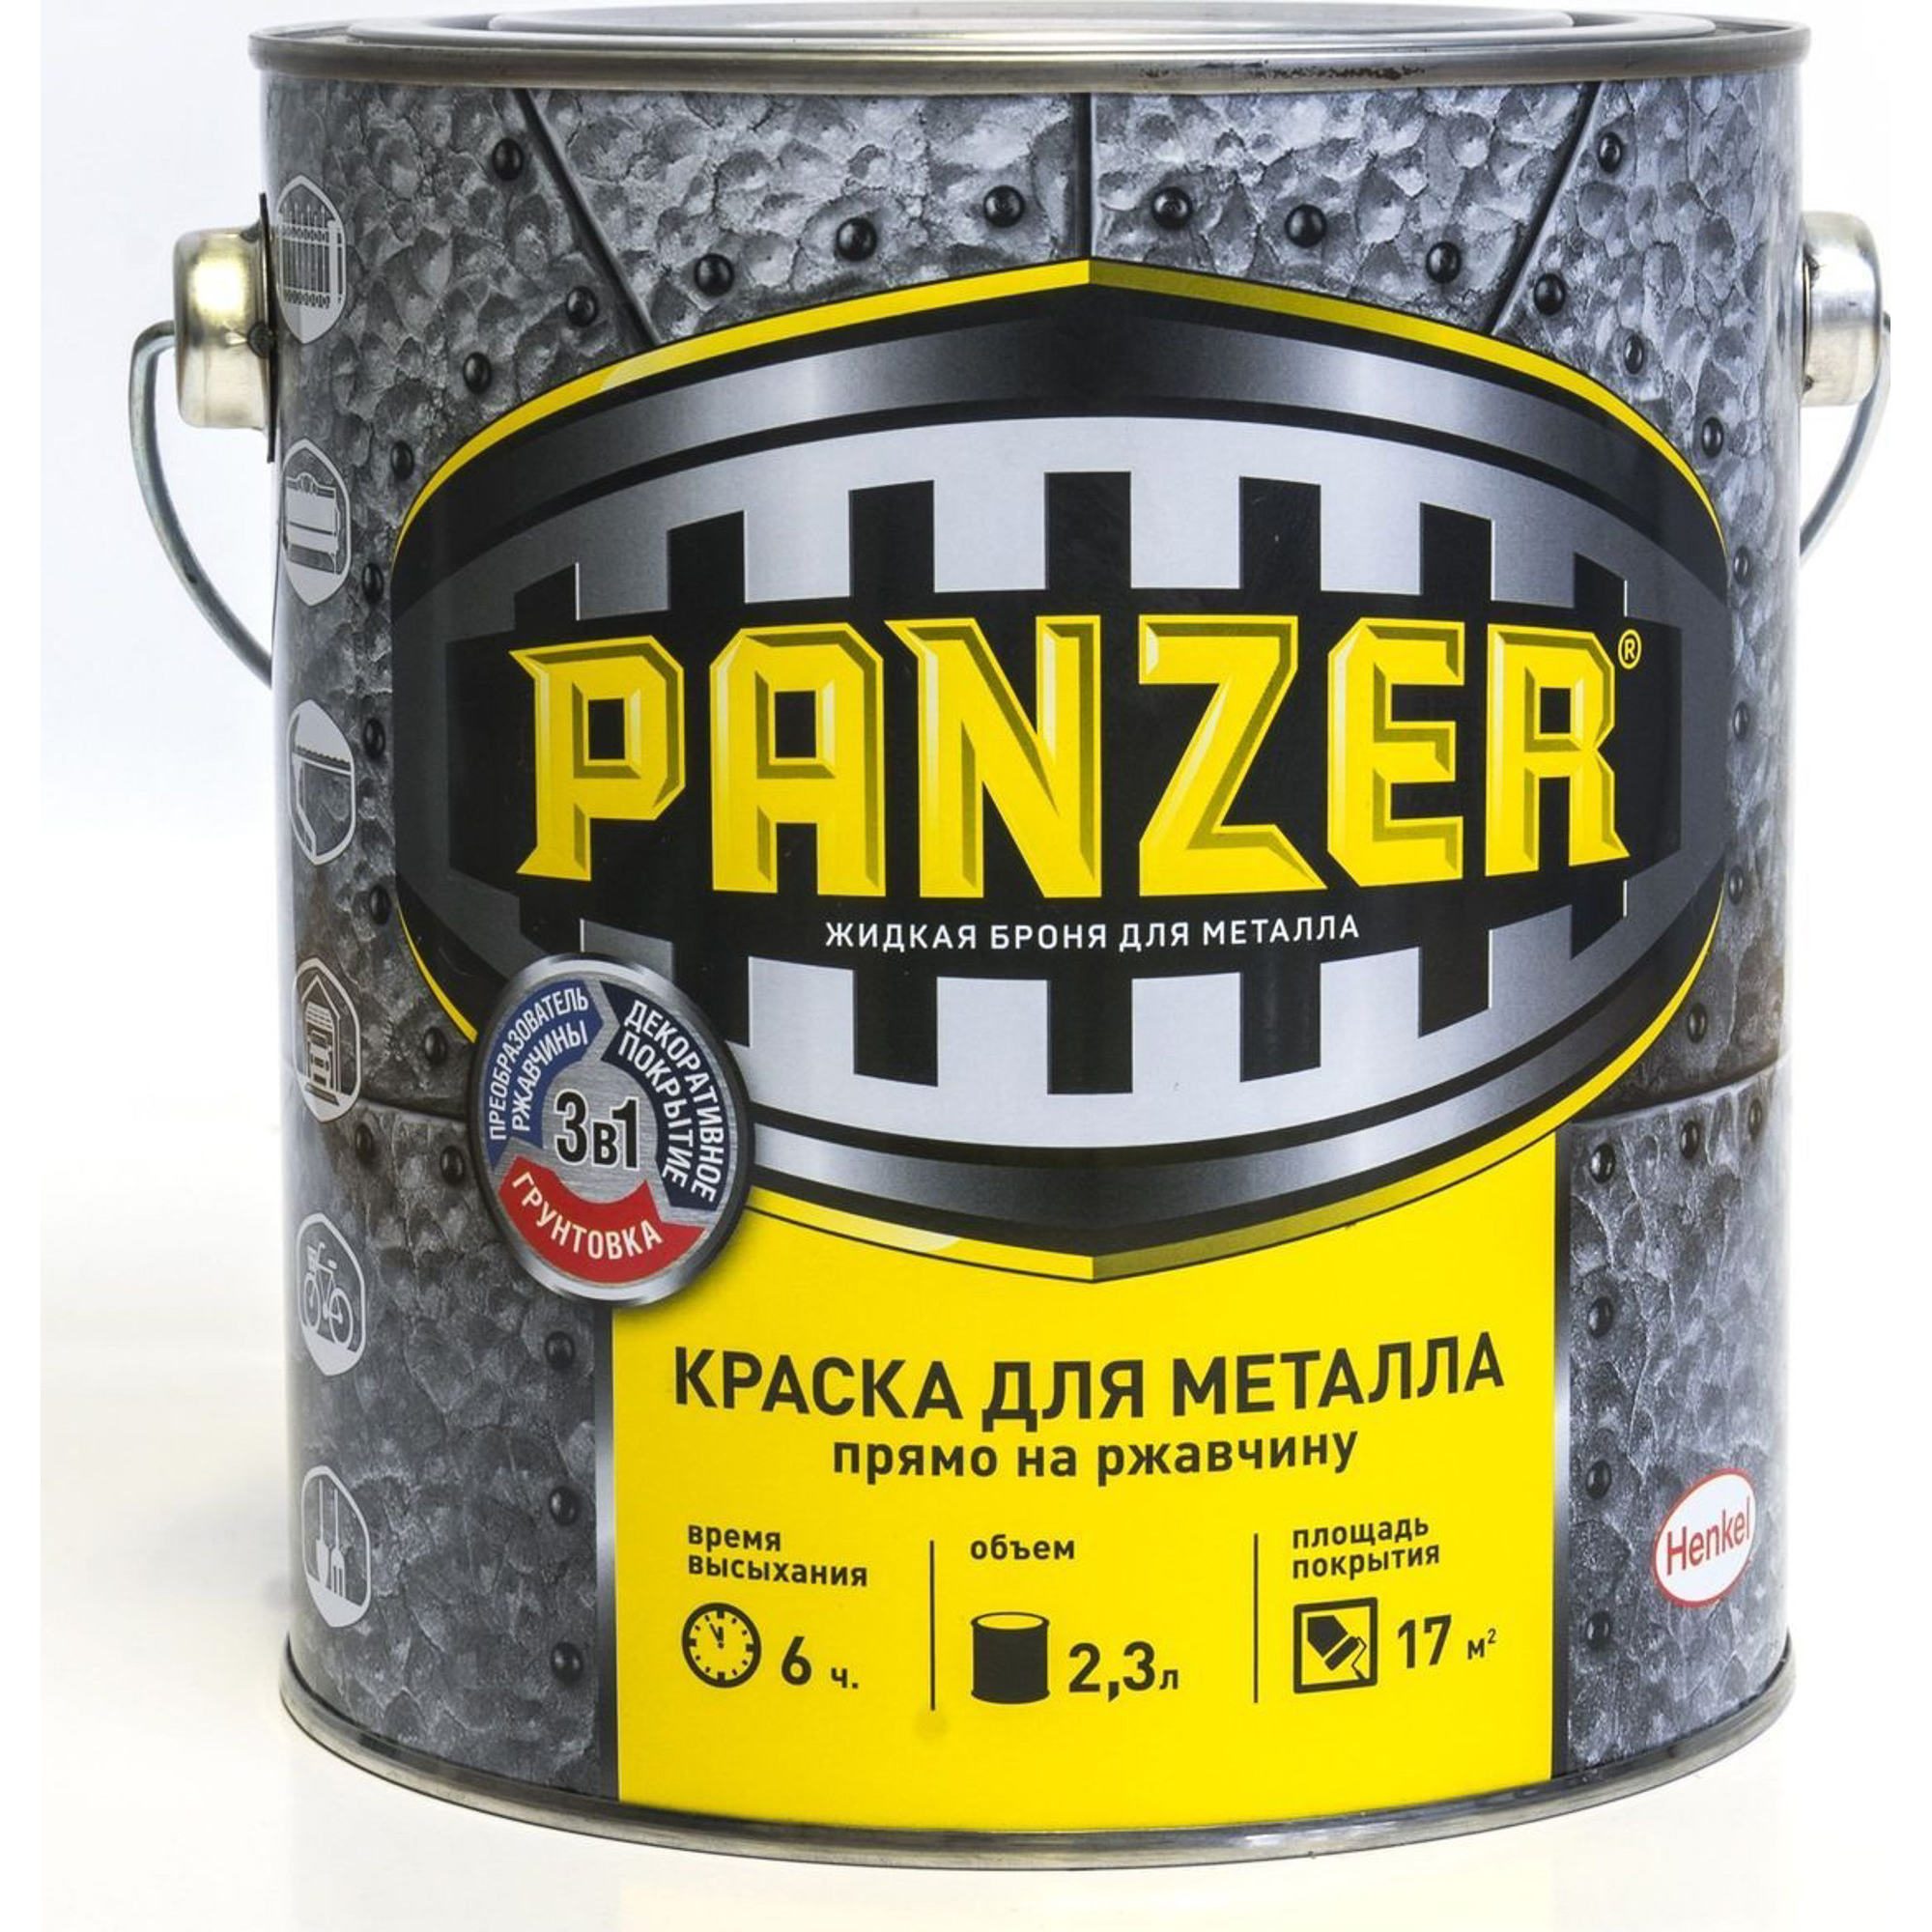 Краска для металла Panzer молотковая красная 2.3 л недорого